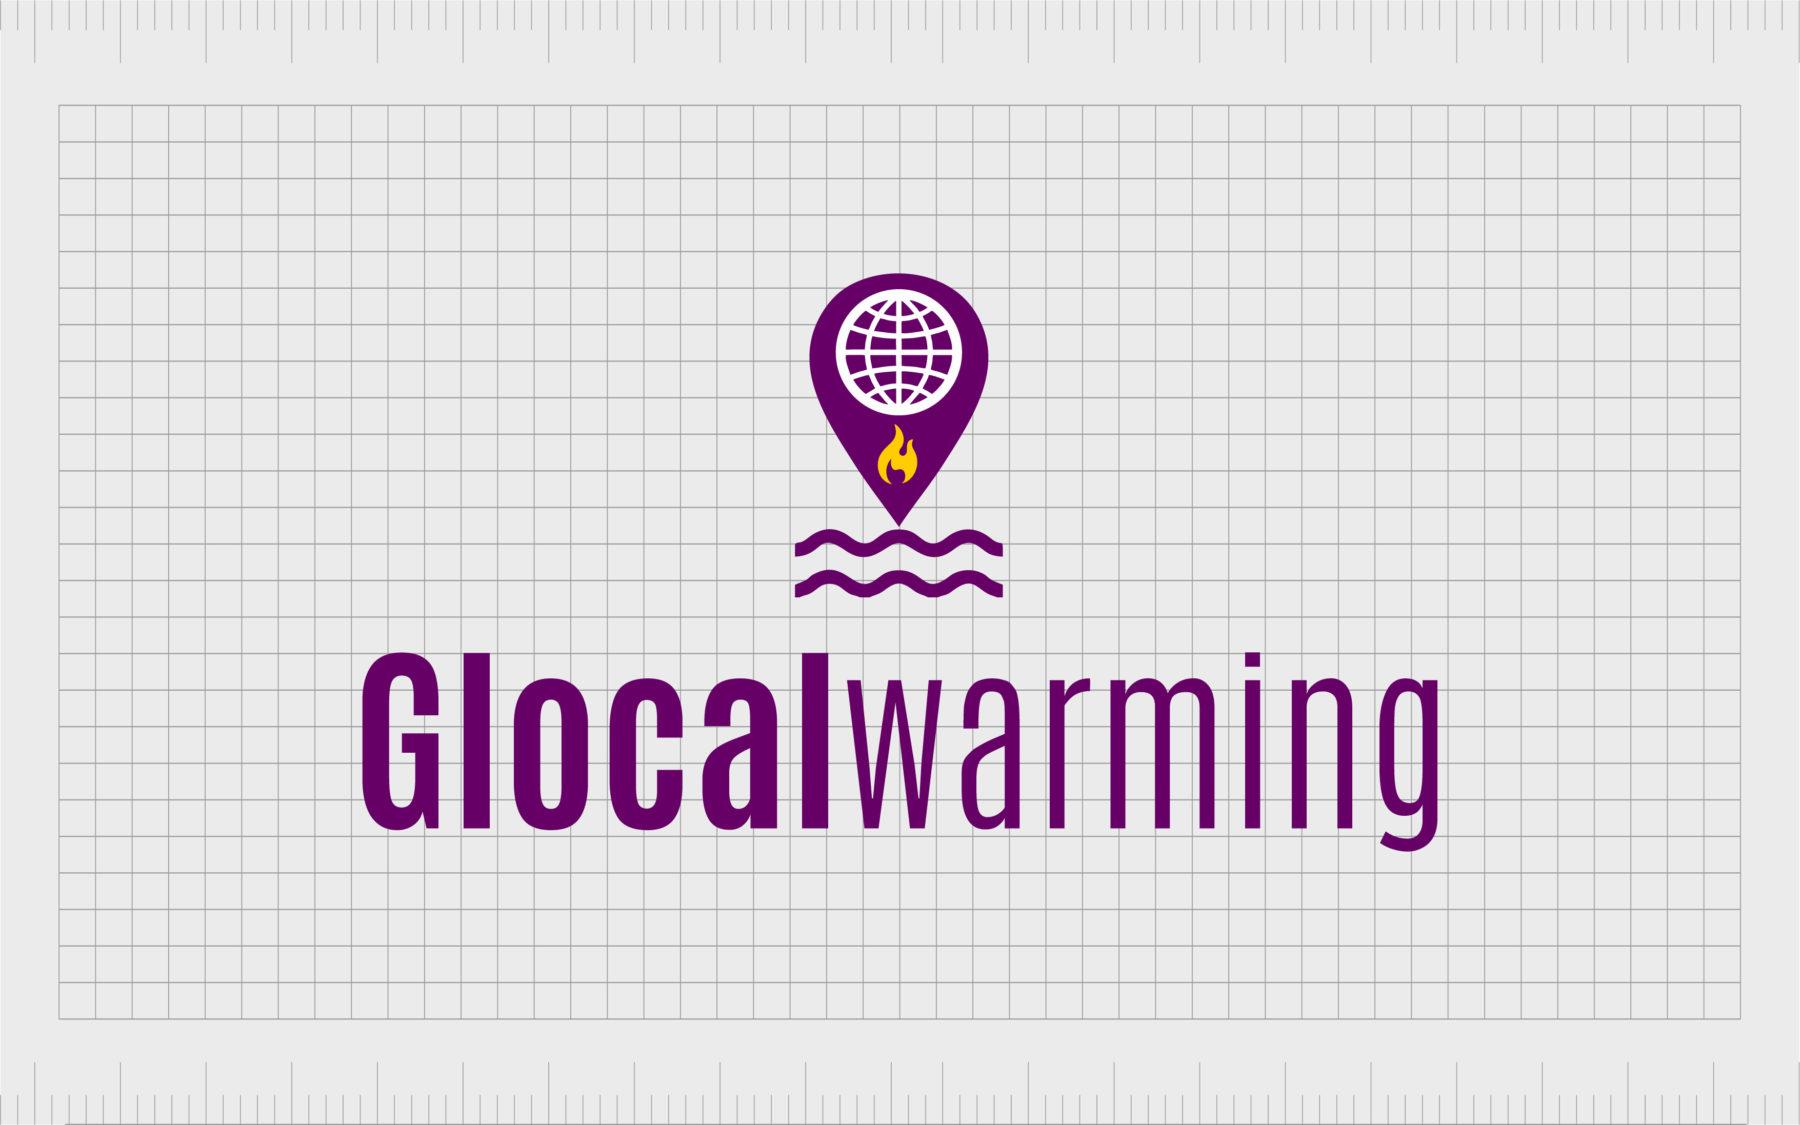 Glocalwarming